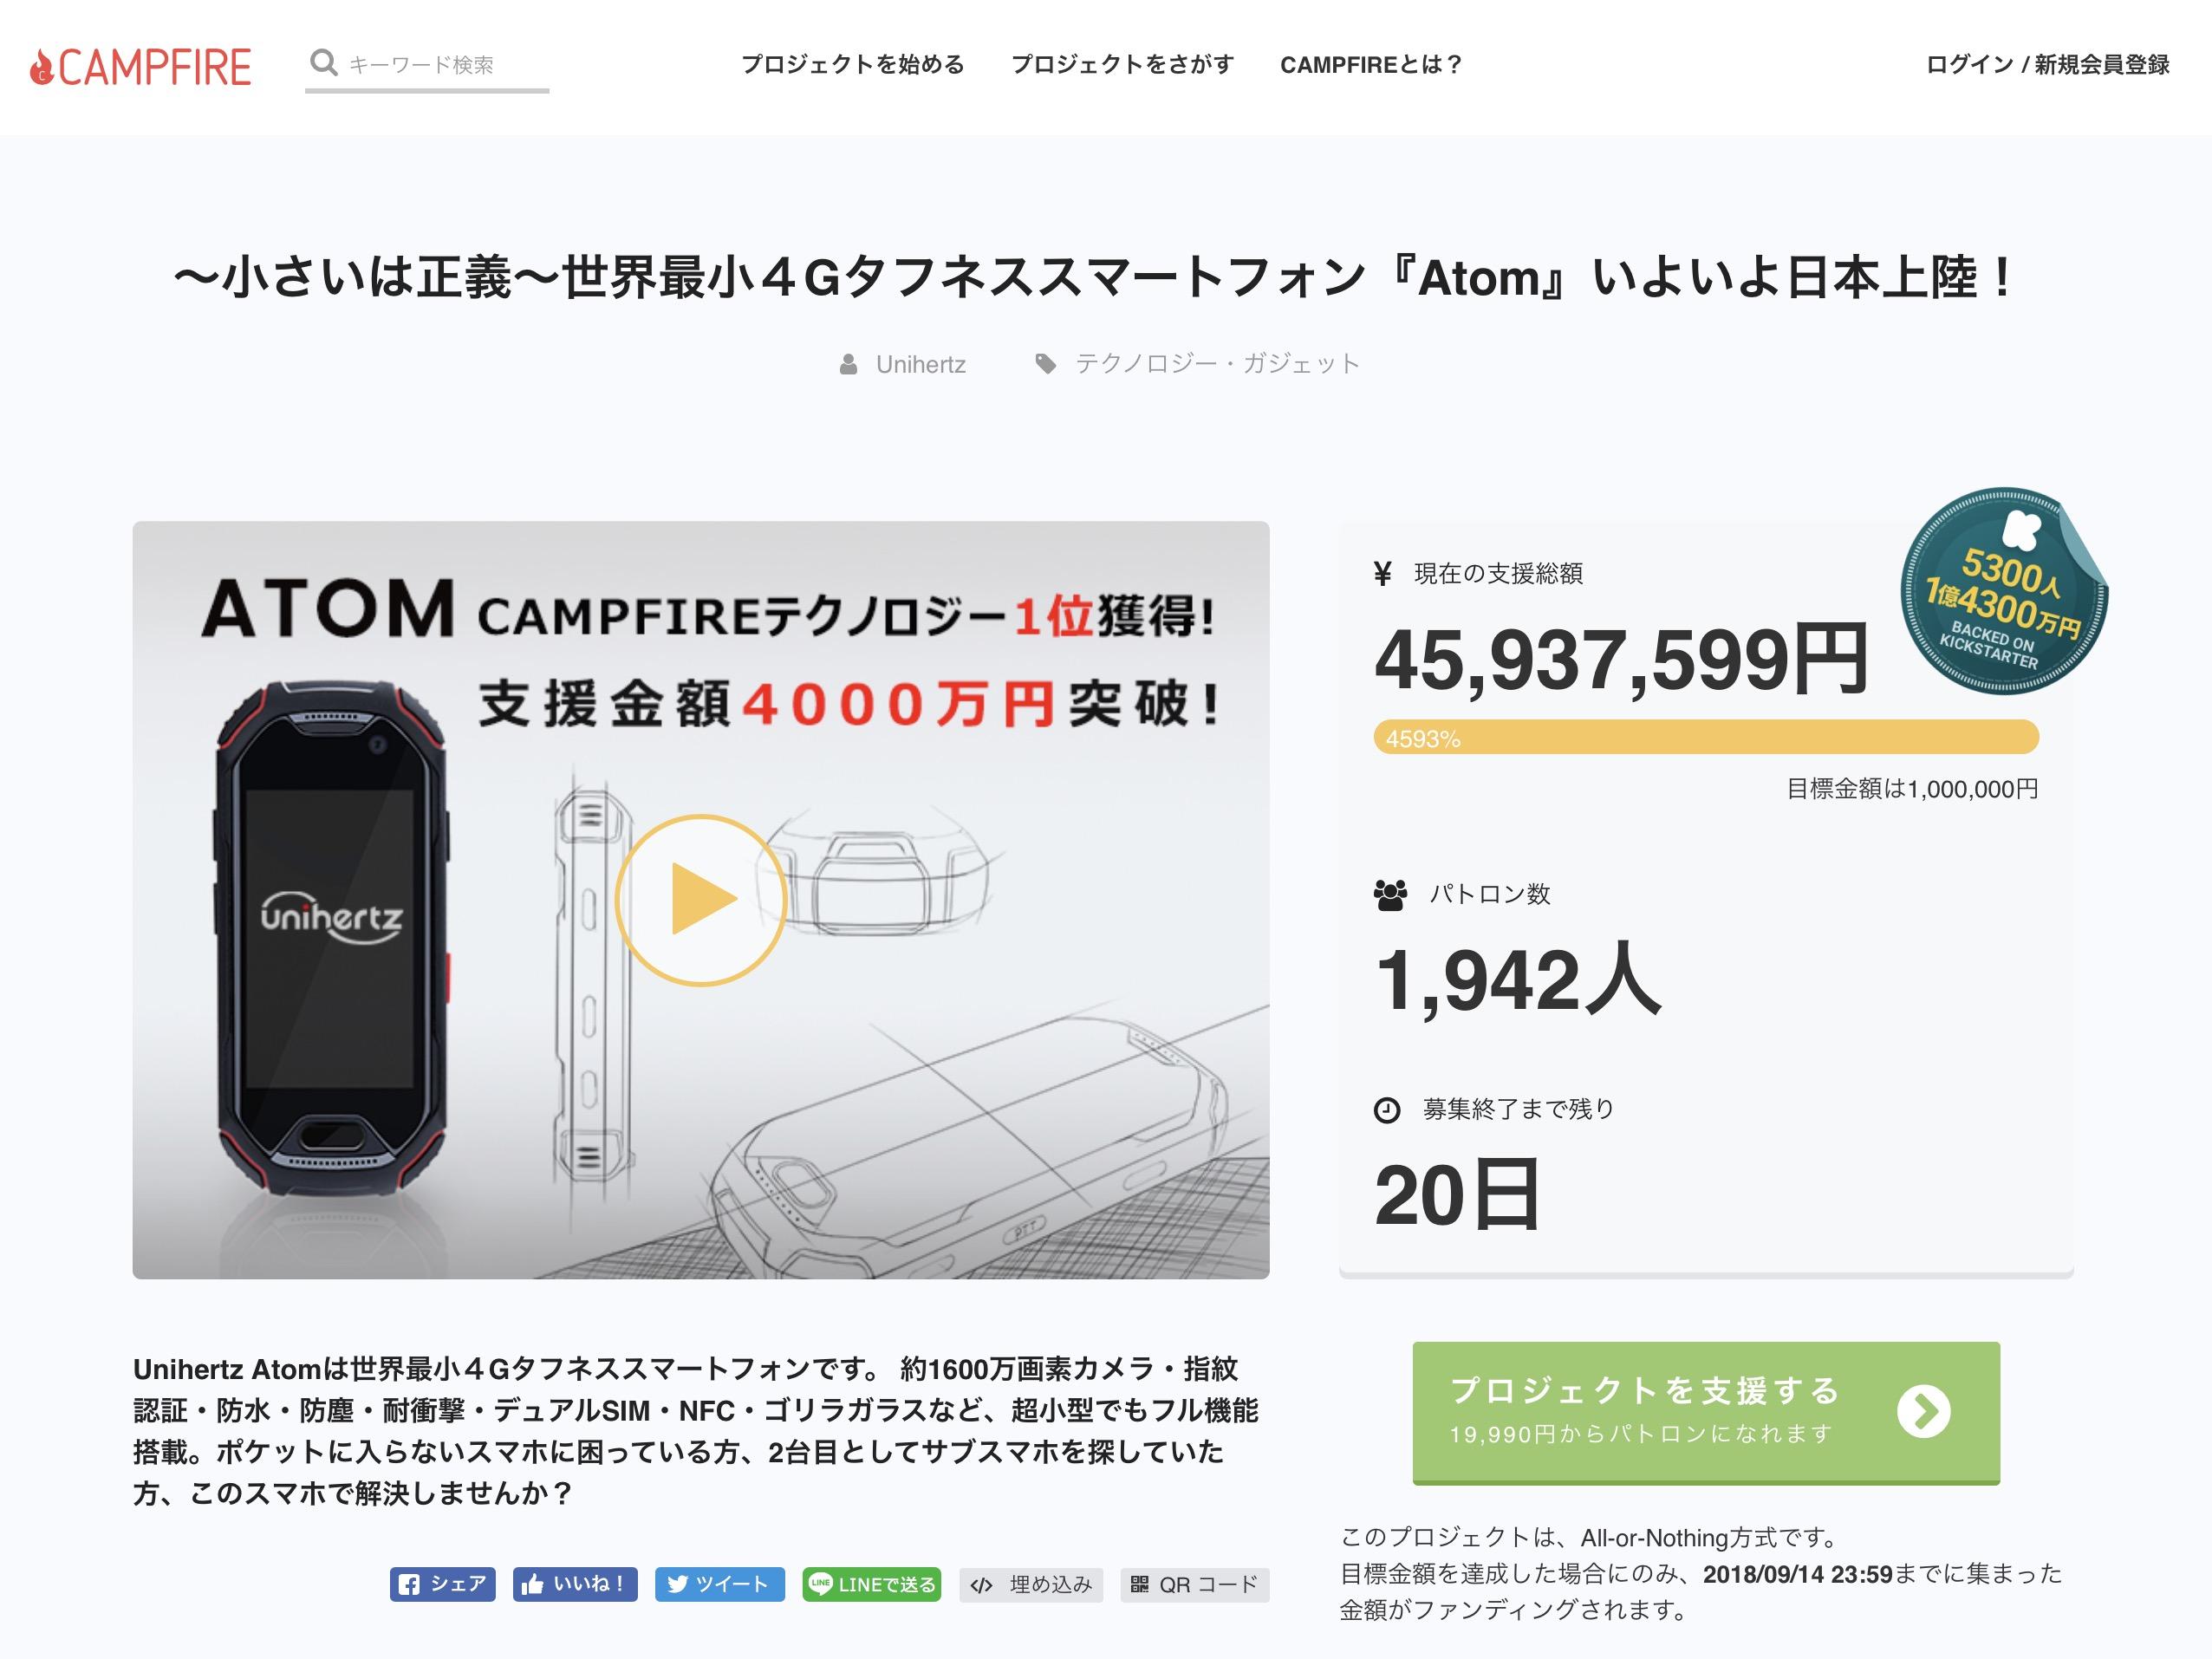 CAMPFIRE(キャンプファイヤー)の成功例⑤ 4,500万円達成!~小さいは正義~世界最小4Gタフネススマートフォン『Atom』いよいよ日本上陸!